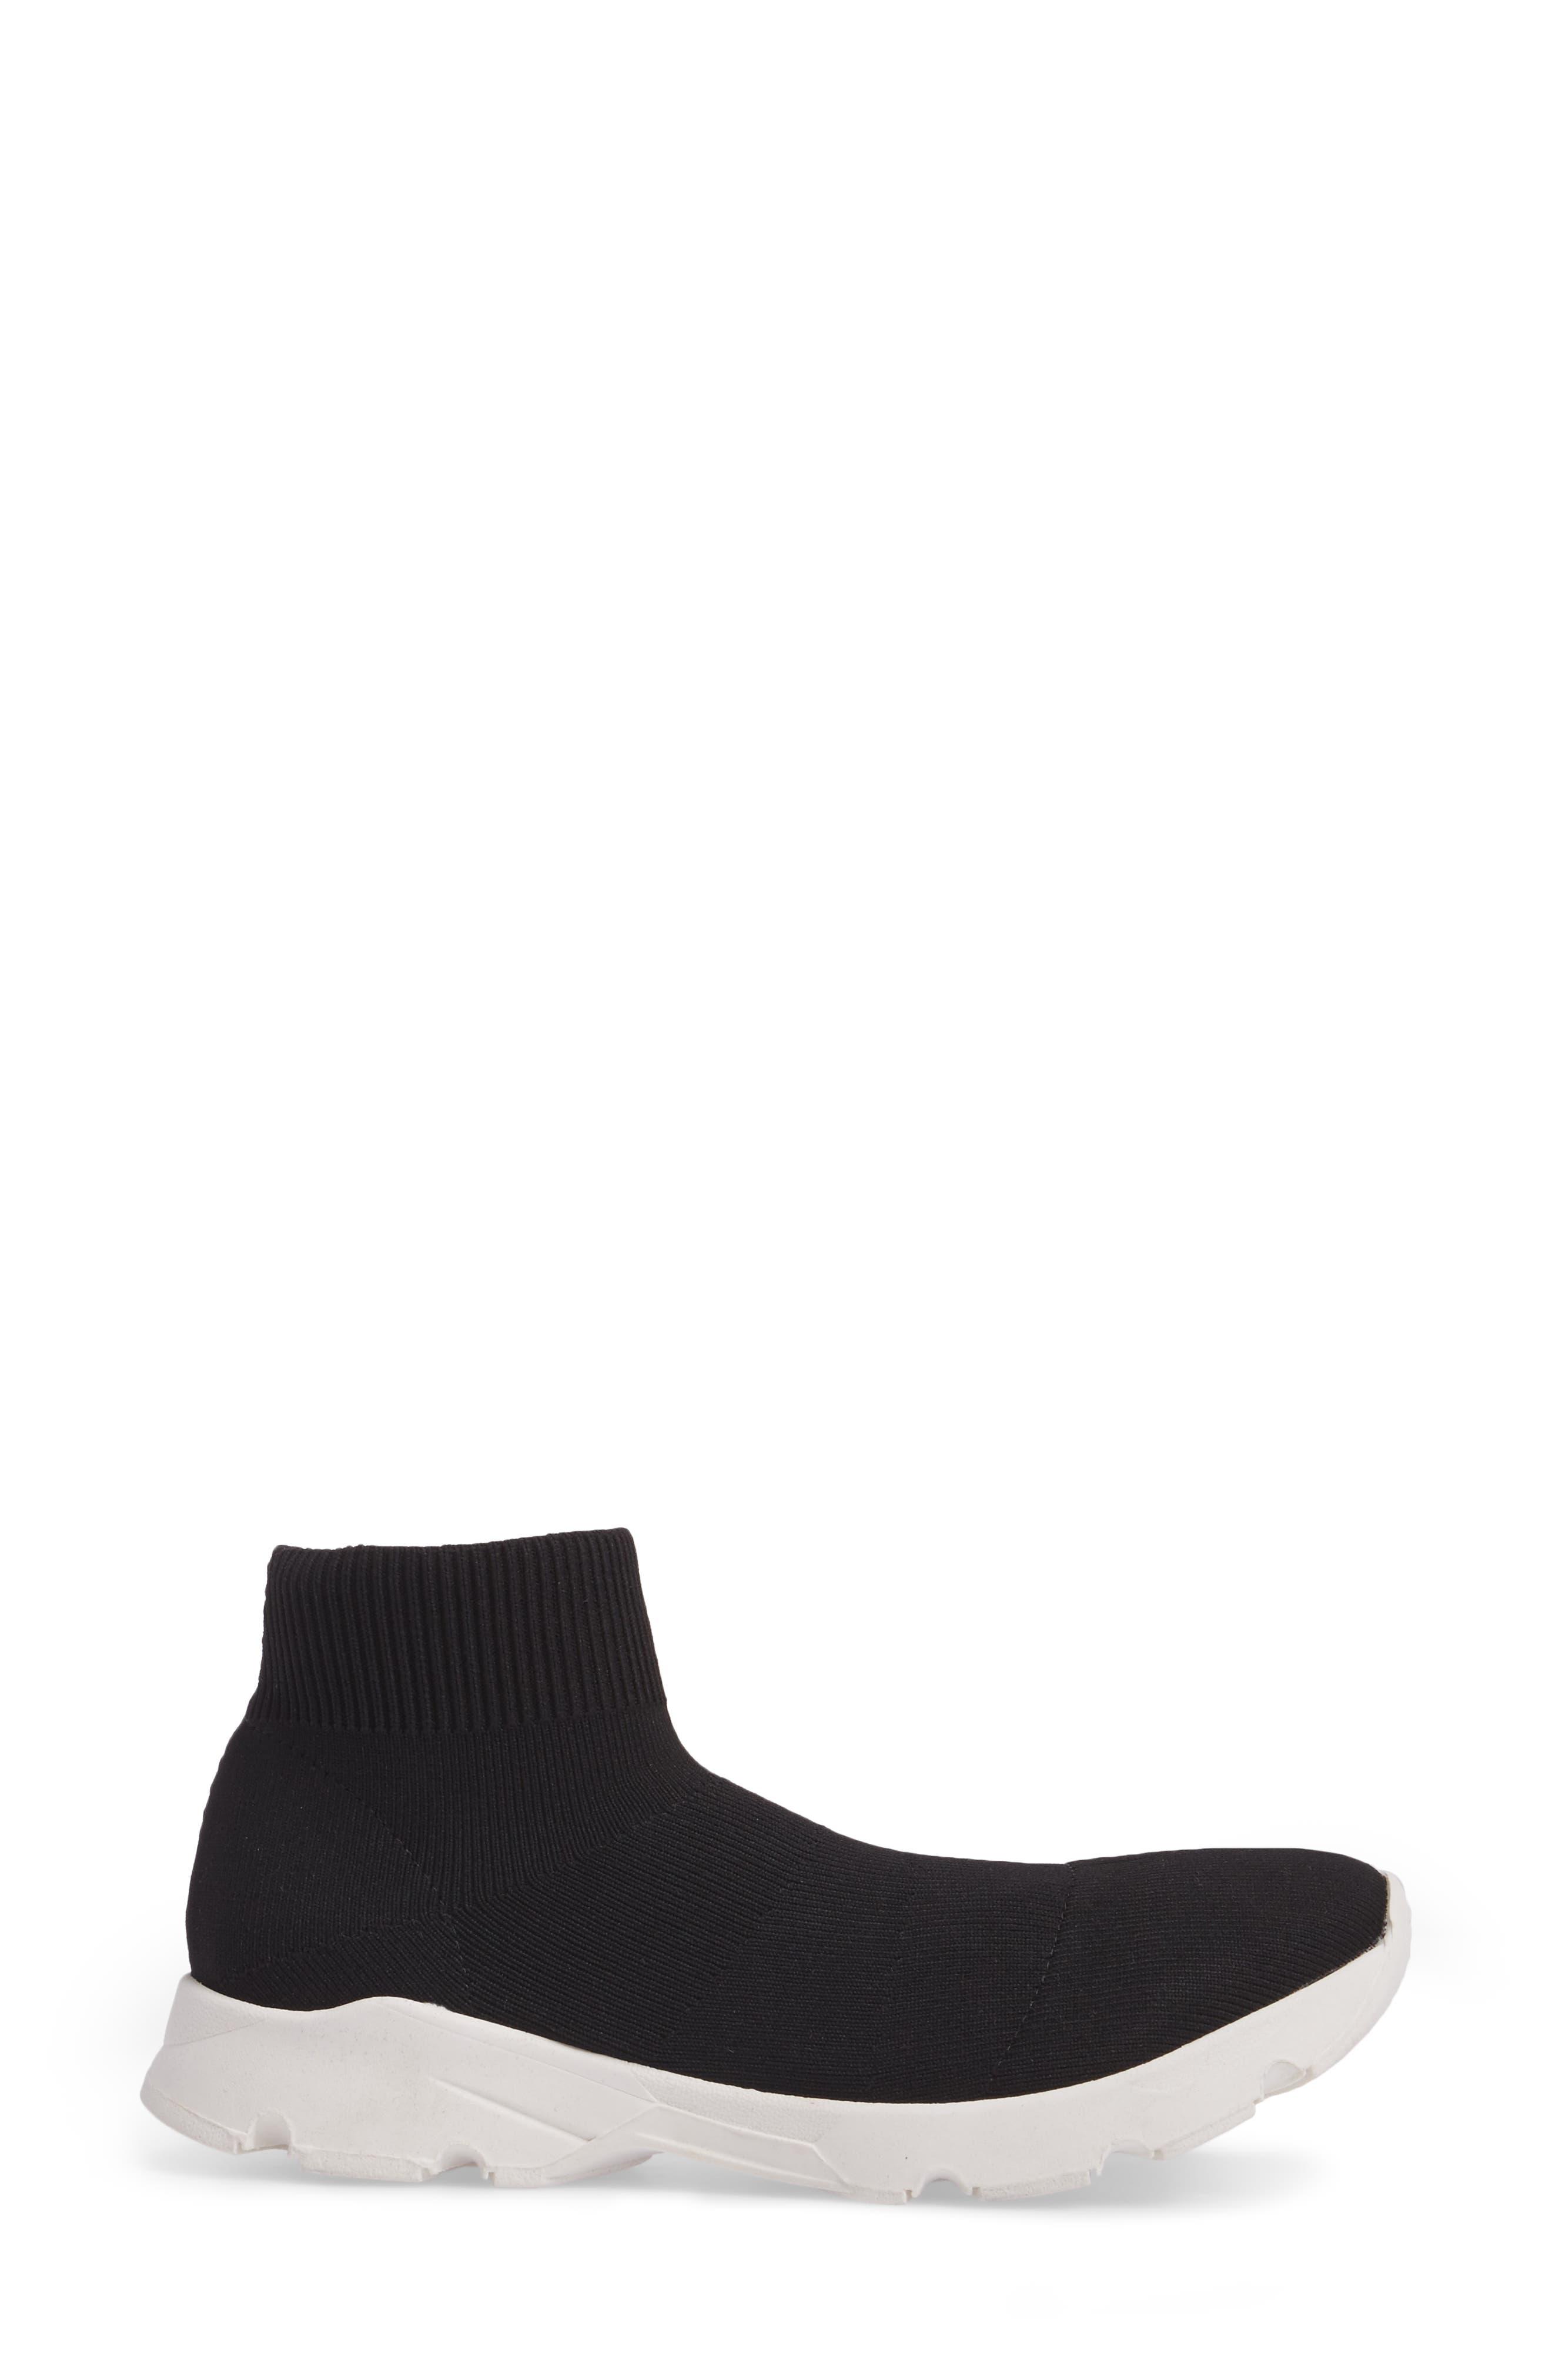 Winston Knit High Top Sneaker,                             Alternate thumbnail 3, color,                             001